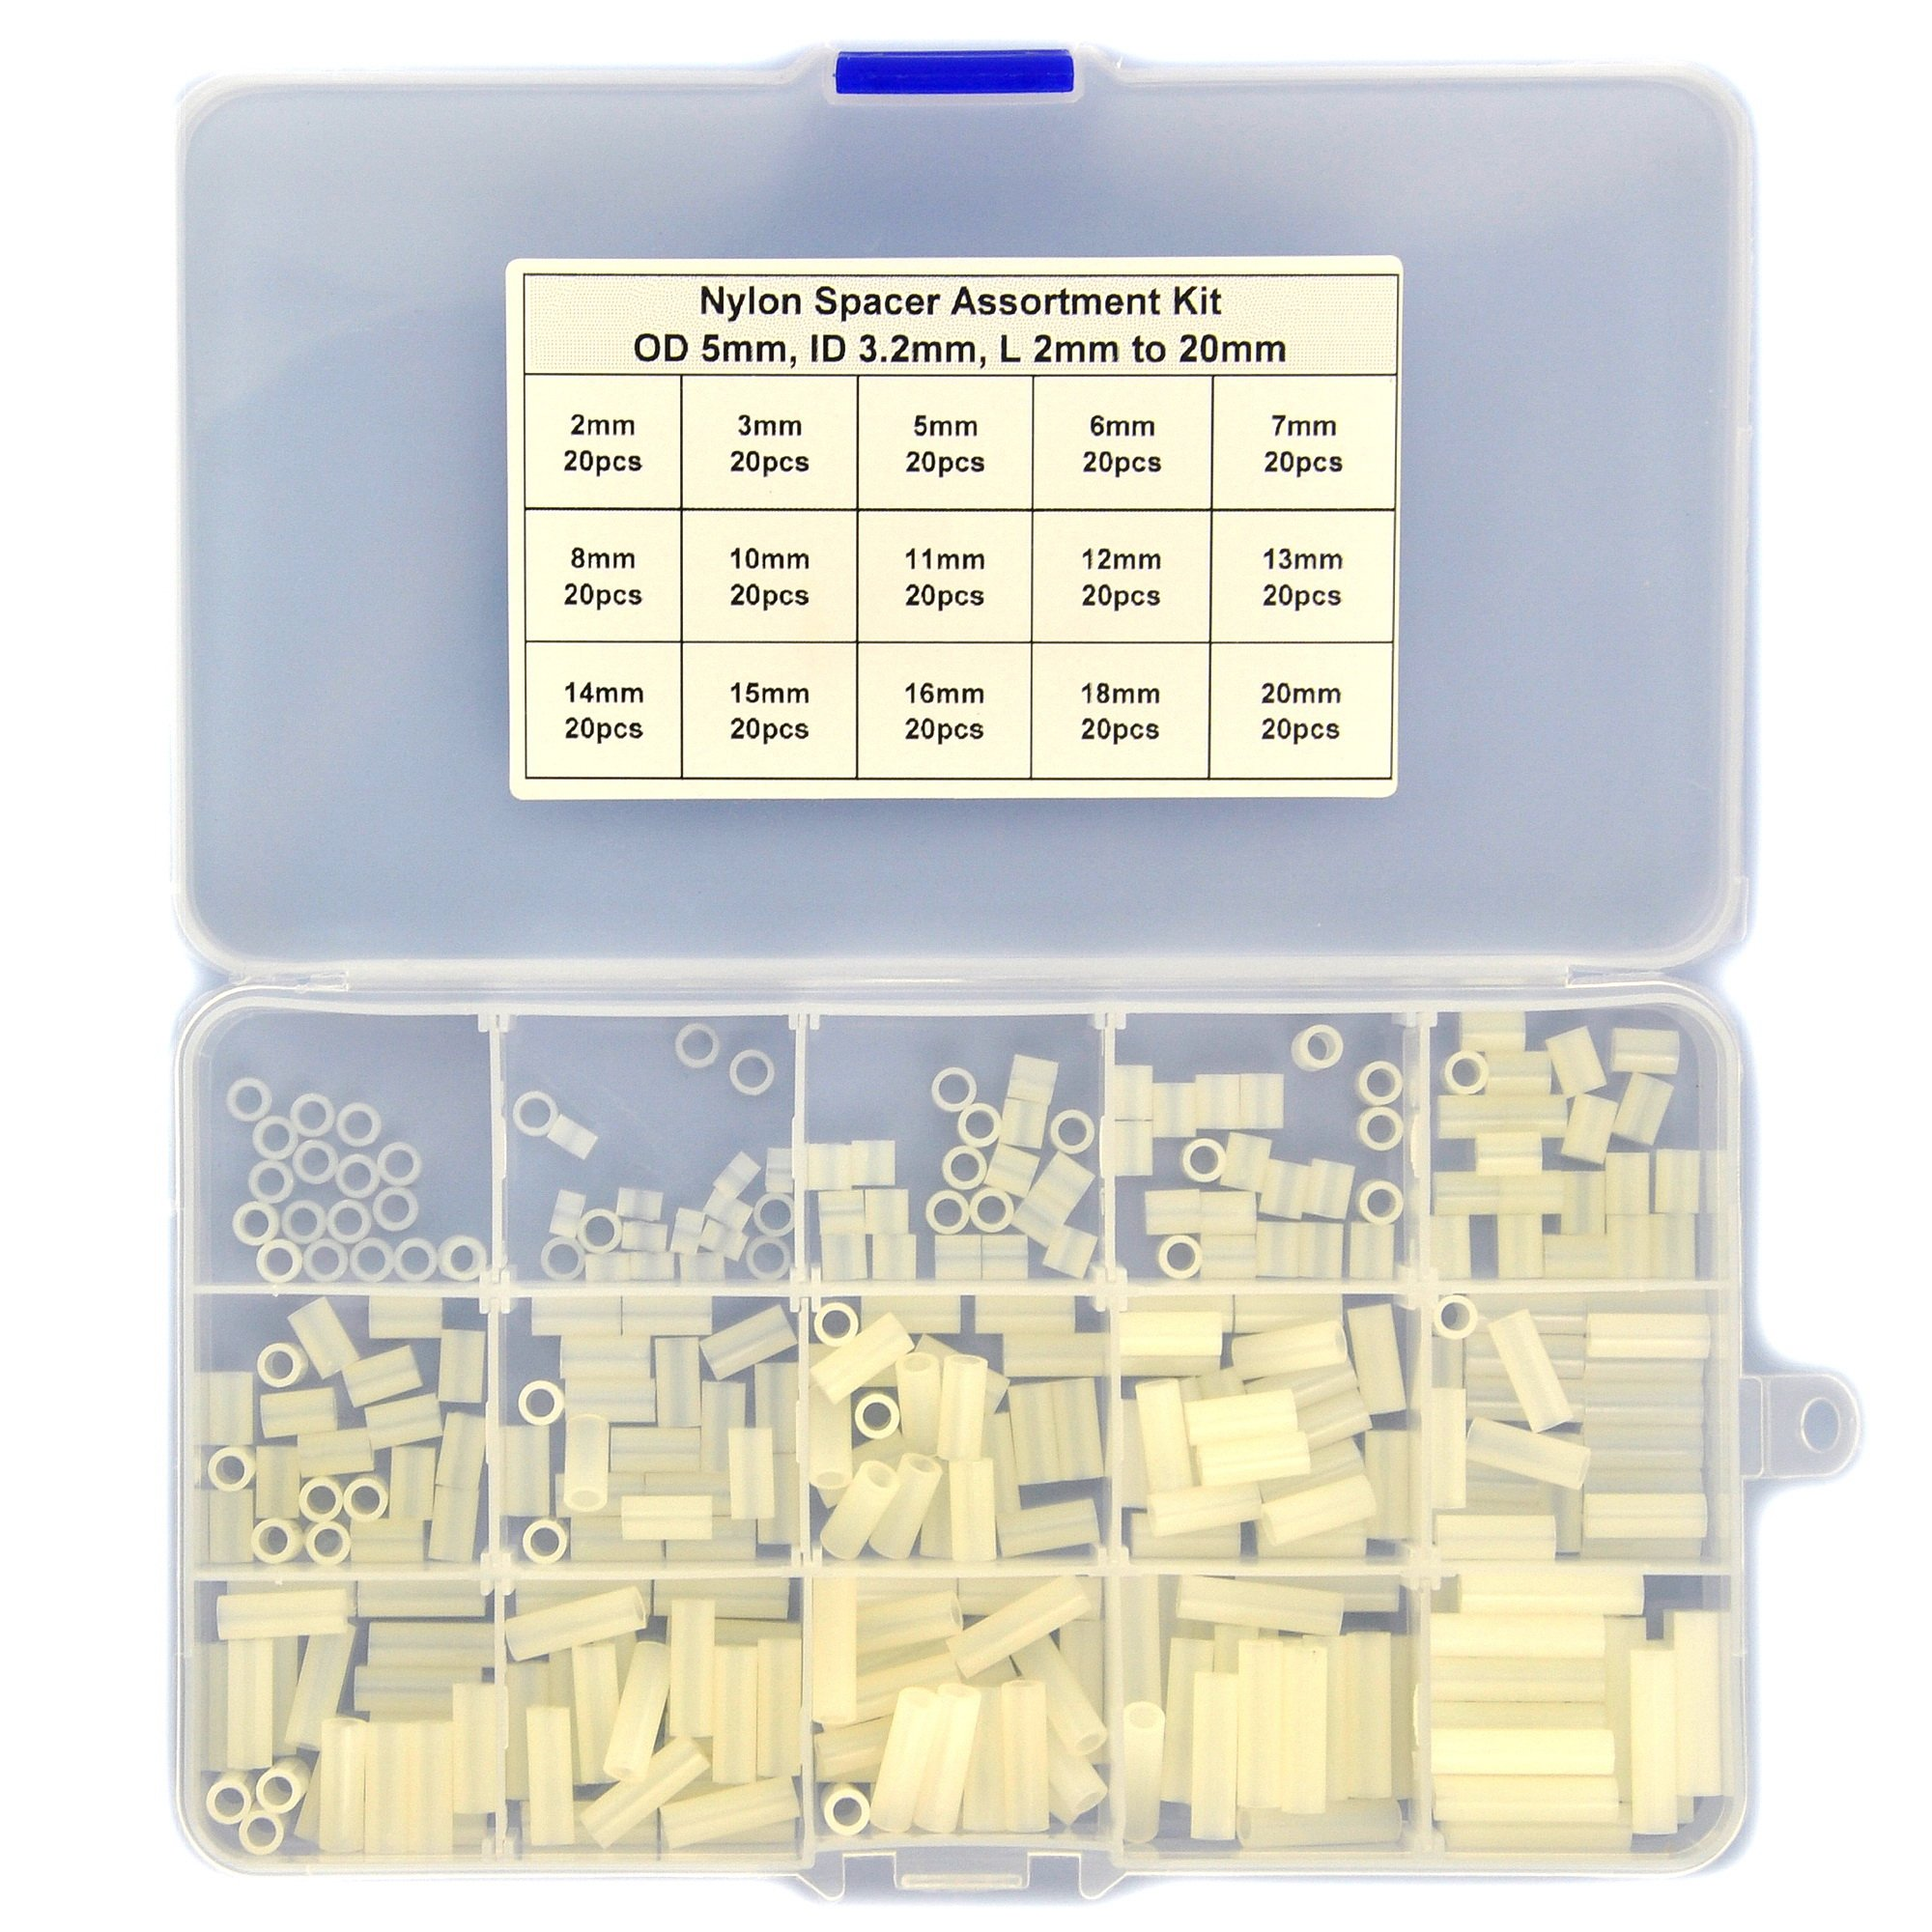 Electronics-Salon Nylon Round Spacer Assortment Kit. OD 5mm, ID 3.2mm, L 2 to 20mm, for M3 Screws. Length 2mm 3mm 5mm 6mm 7mm 8mm 10mm 11mm 12mm 13mm 14mm 15mm 16mm 18mm 20mm, Plastic PA66 Standoff. by Electronics-Salon